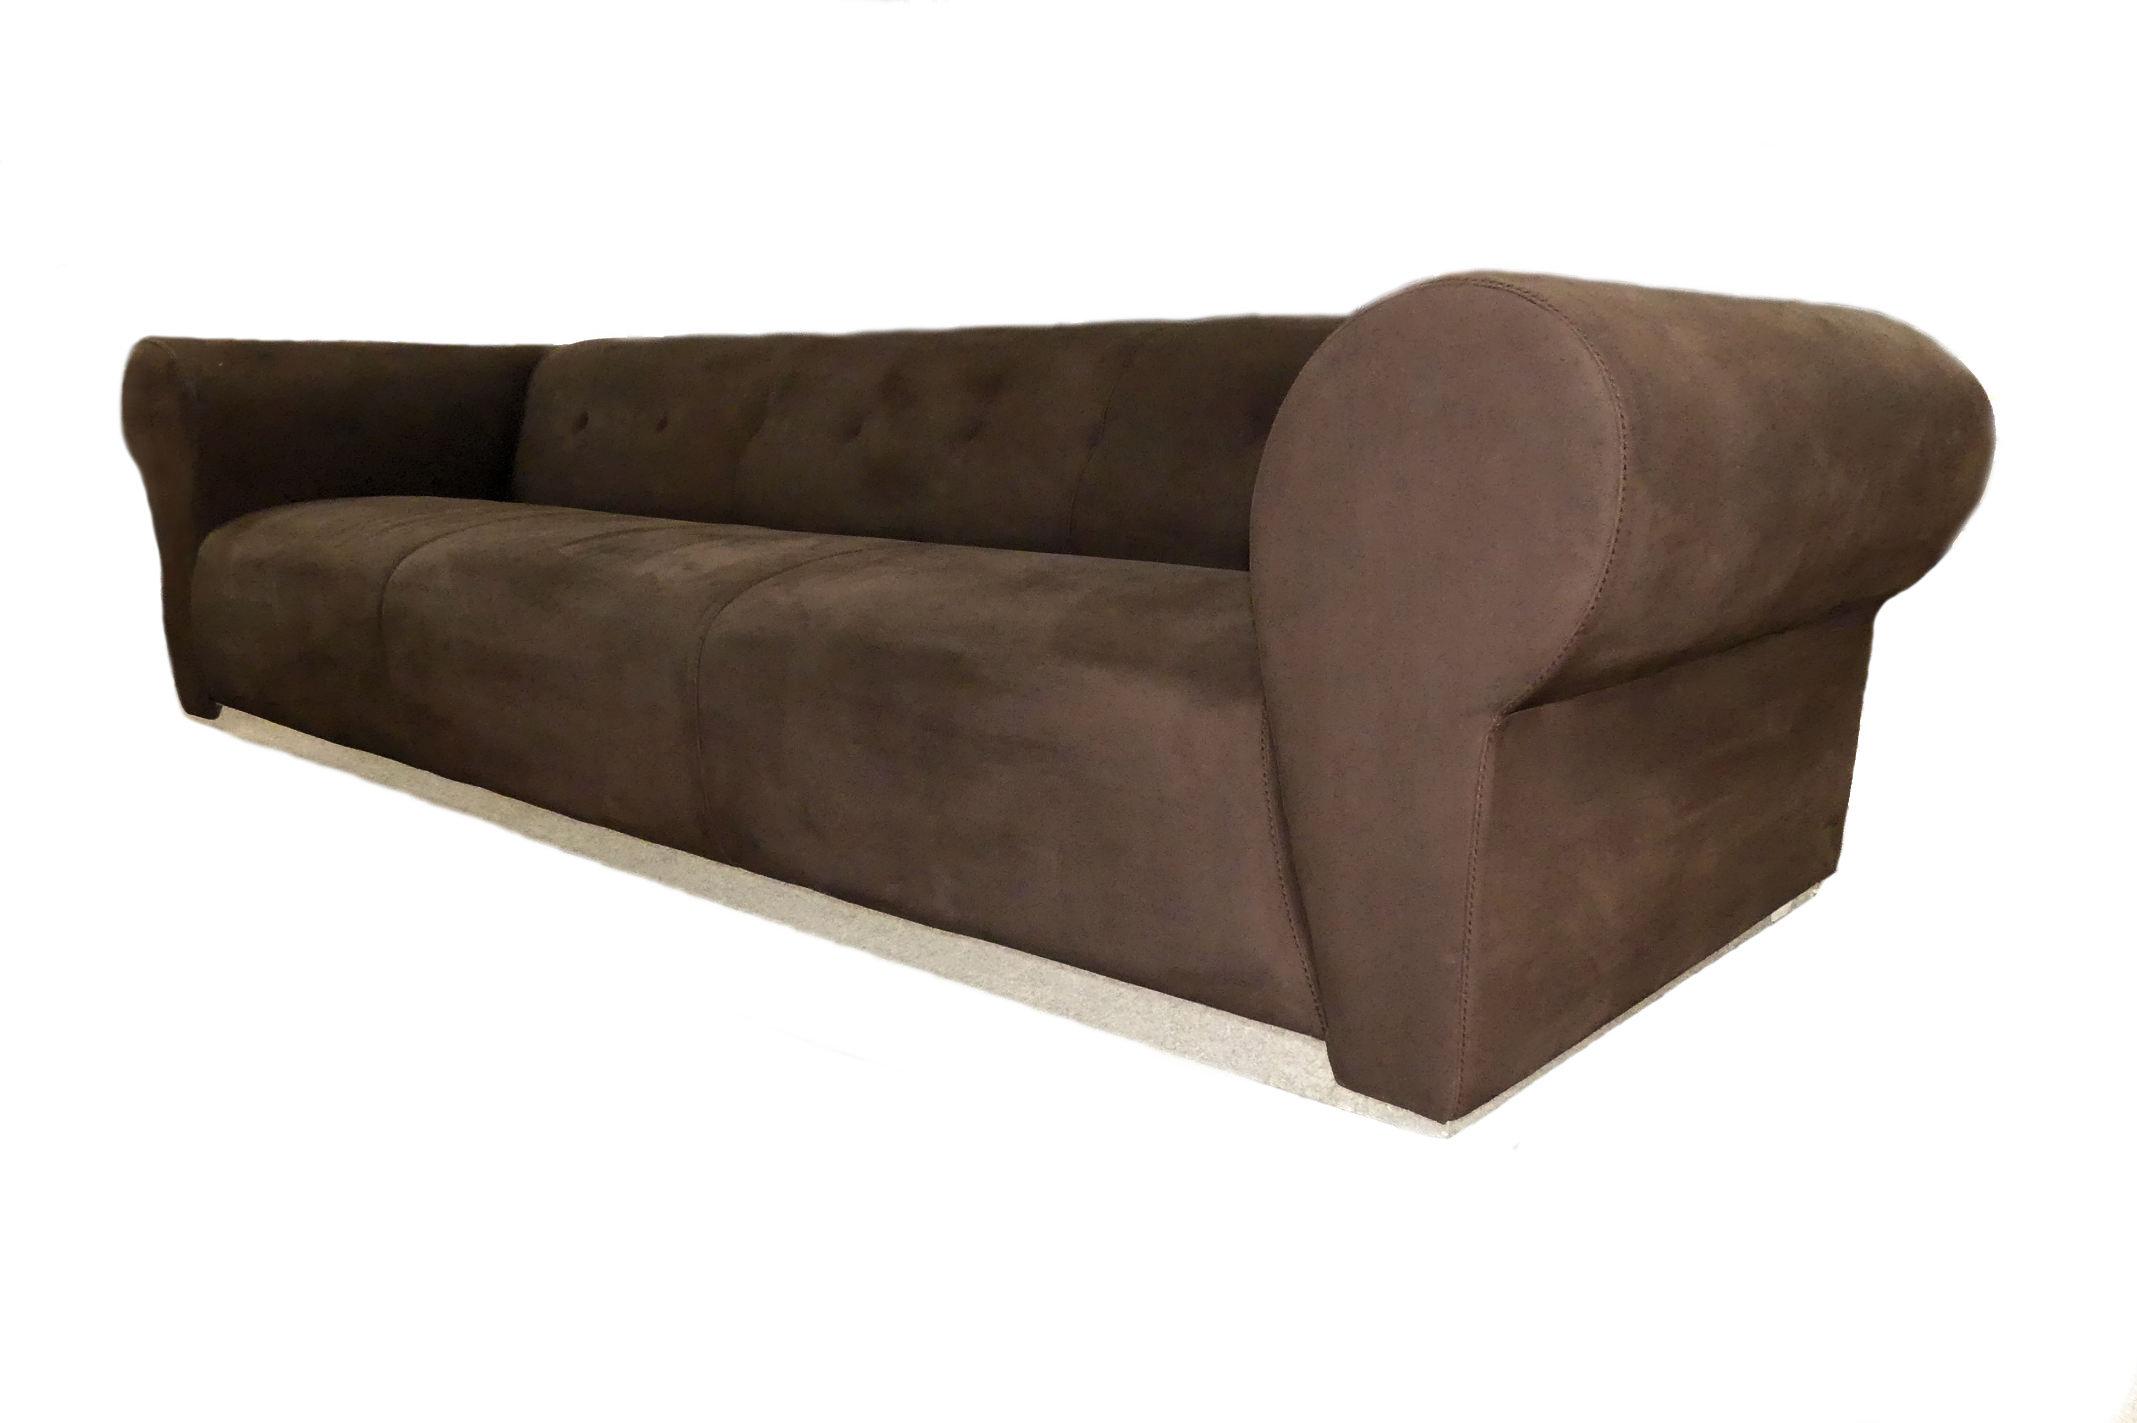 SOLD  Fendi Casa Chocolate Brown Suede Sofa